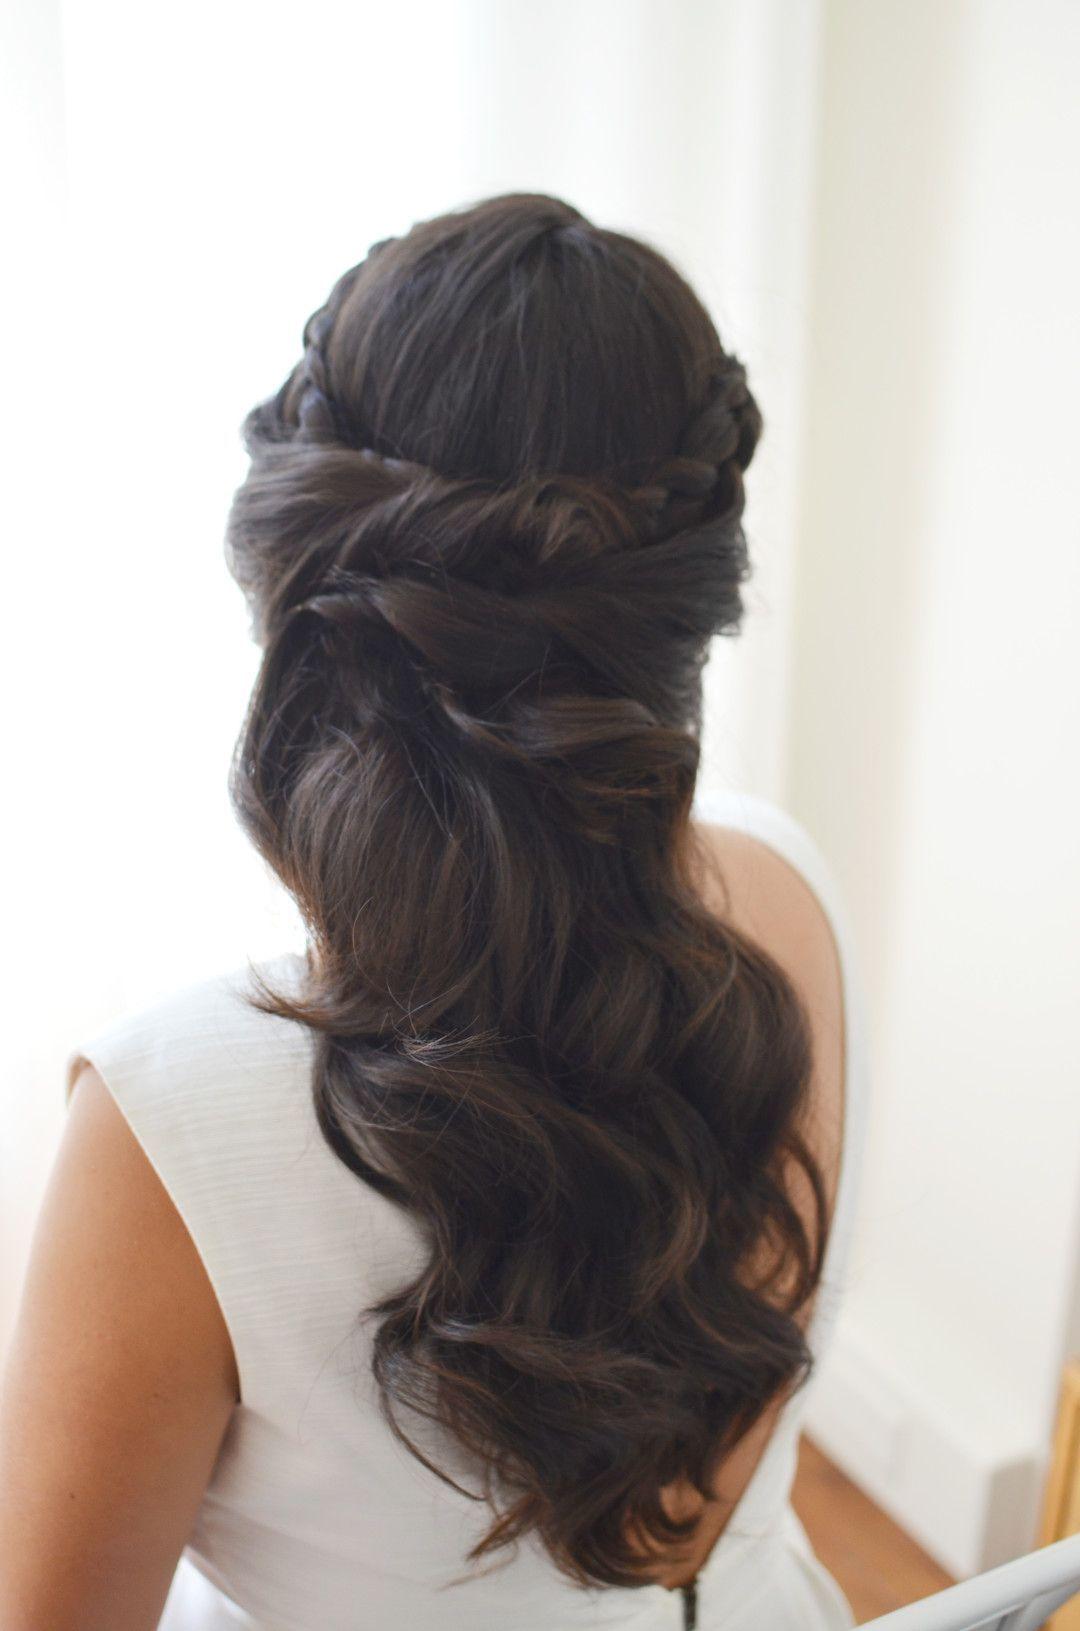 women's hairstyle | womens hairstyles long balayage